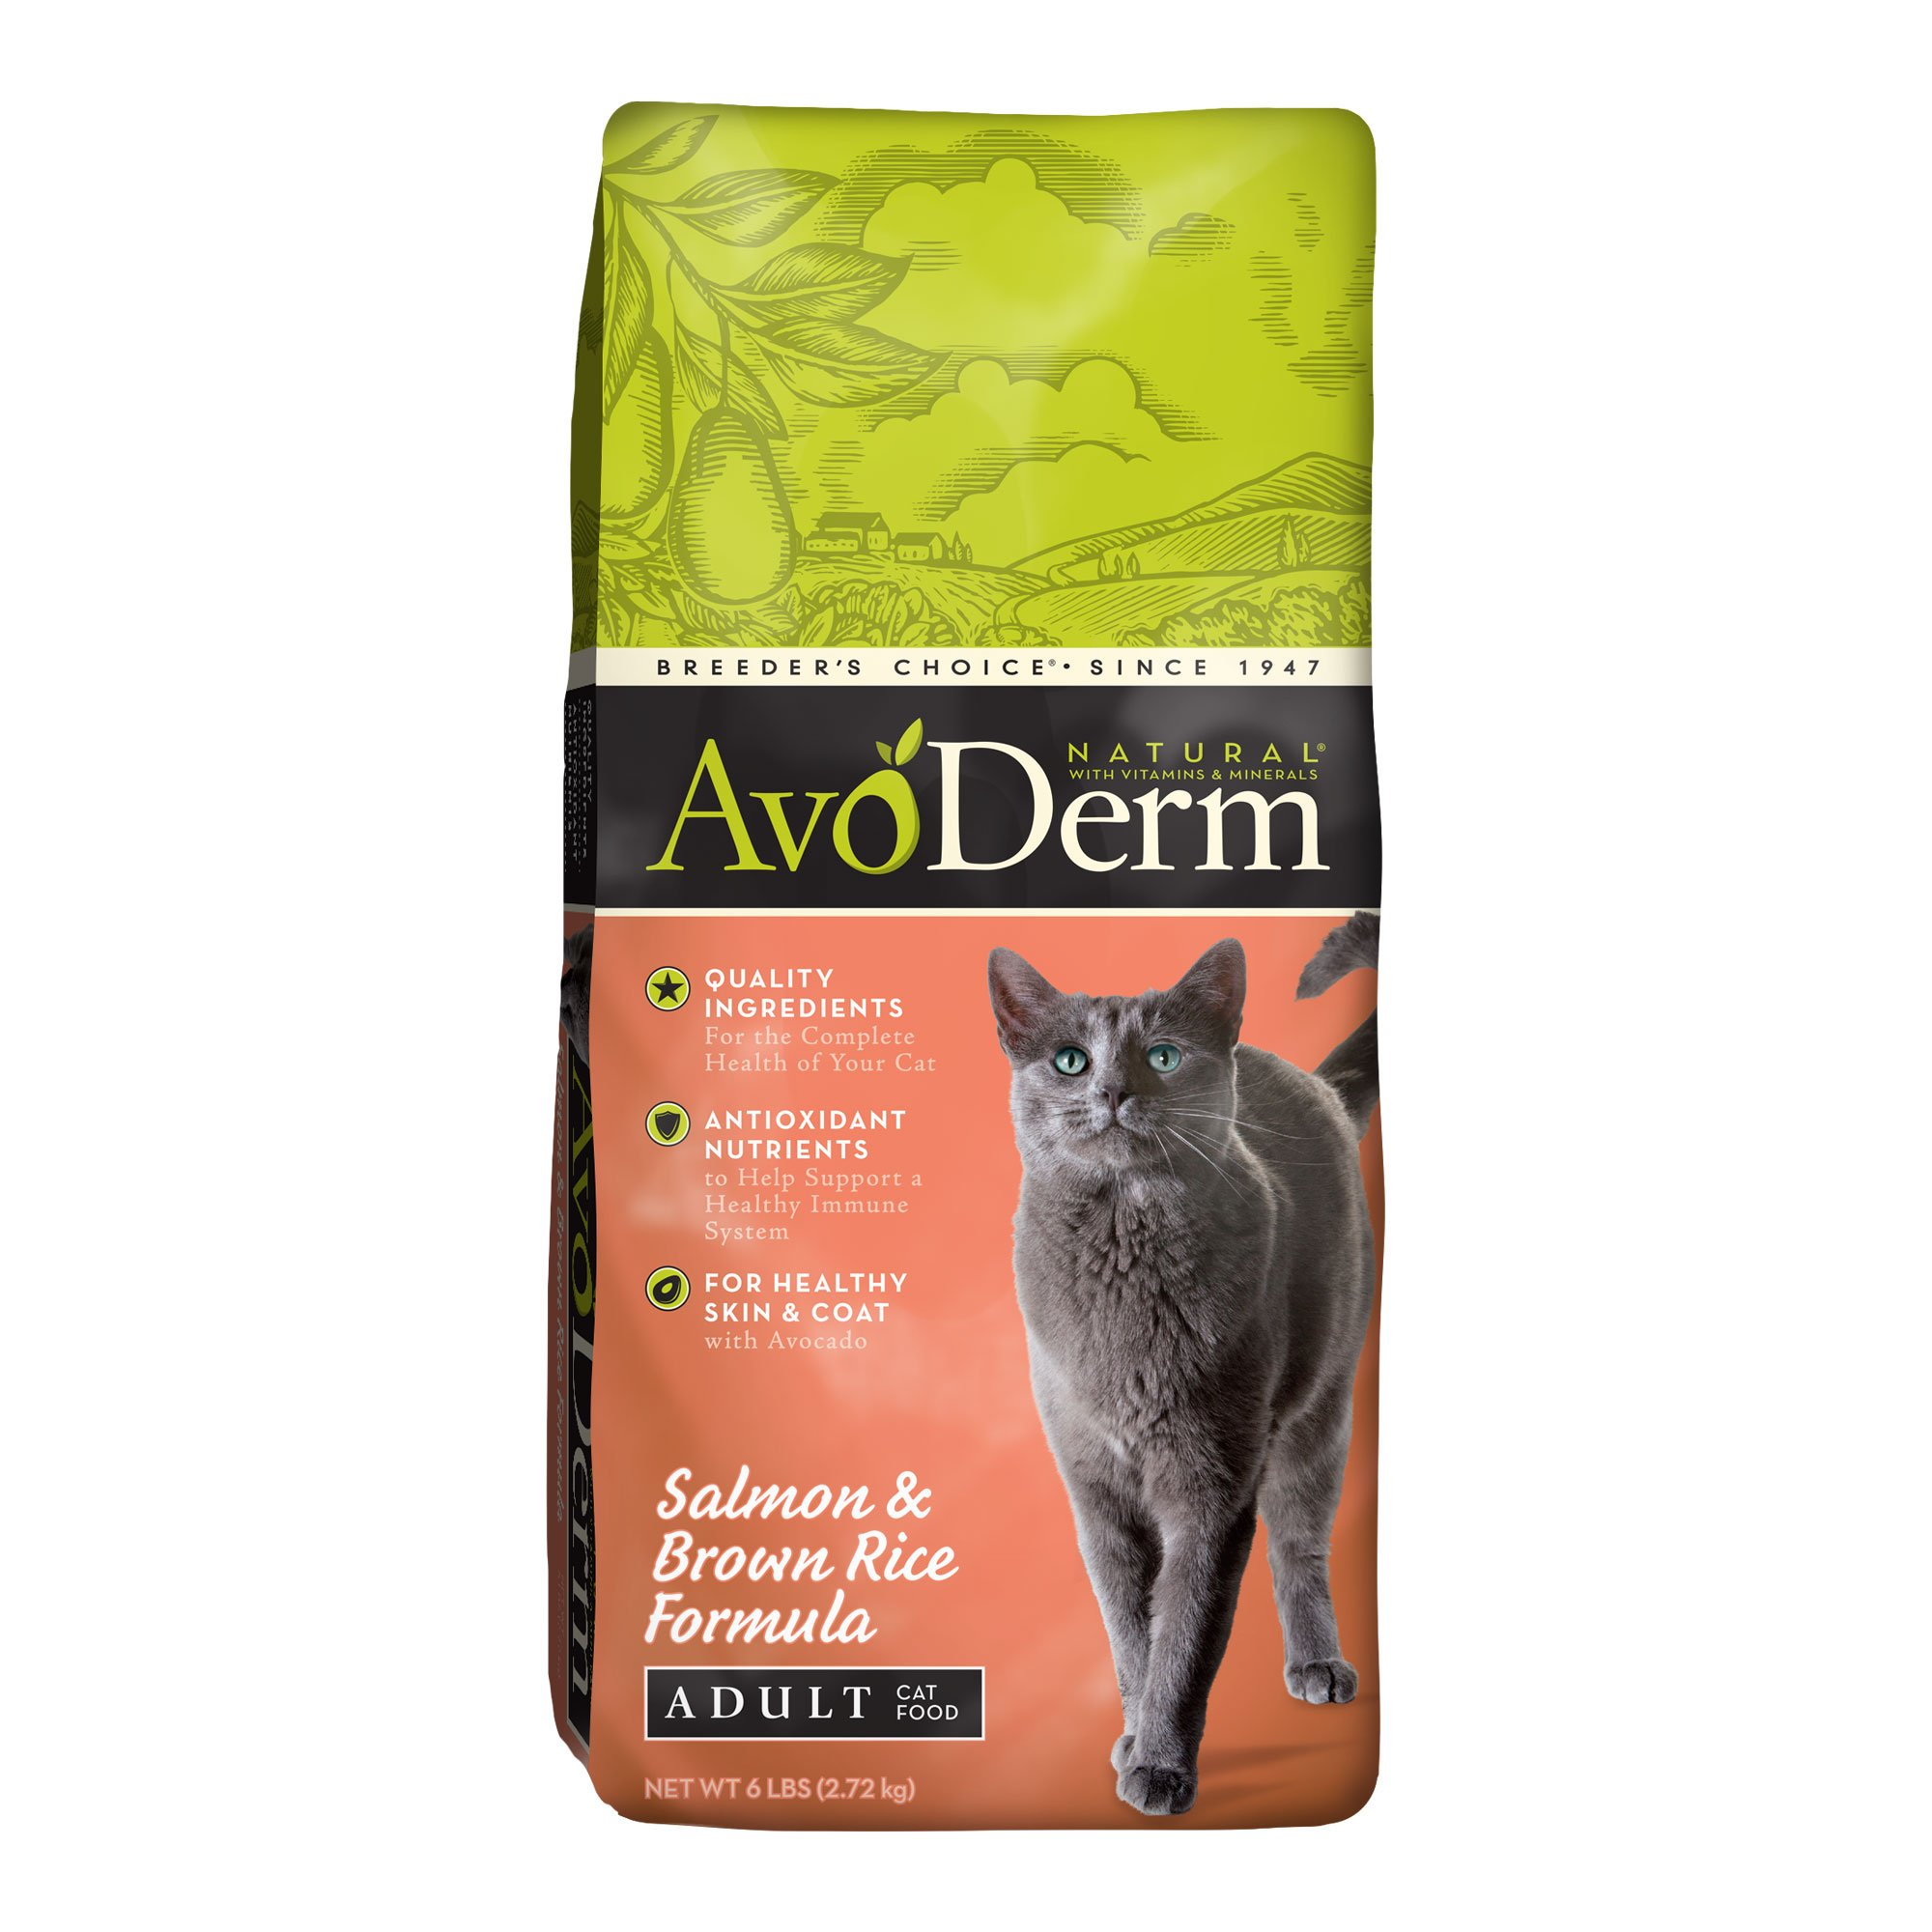 AvoDerm Natural Salmon & Brown Rice Adult Cat Food